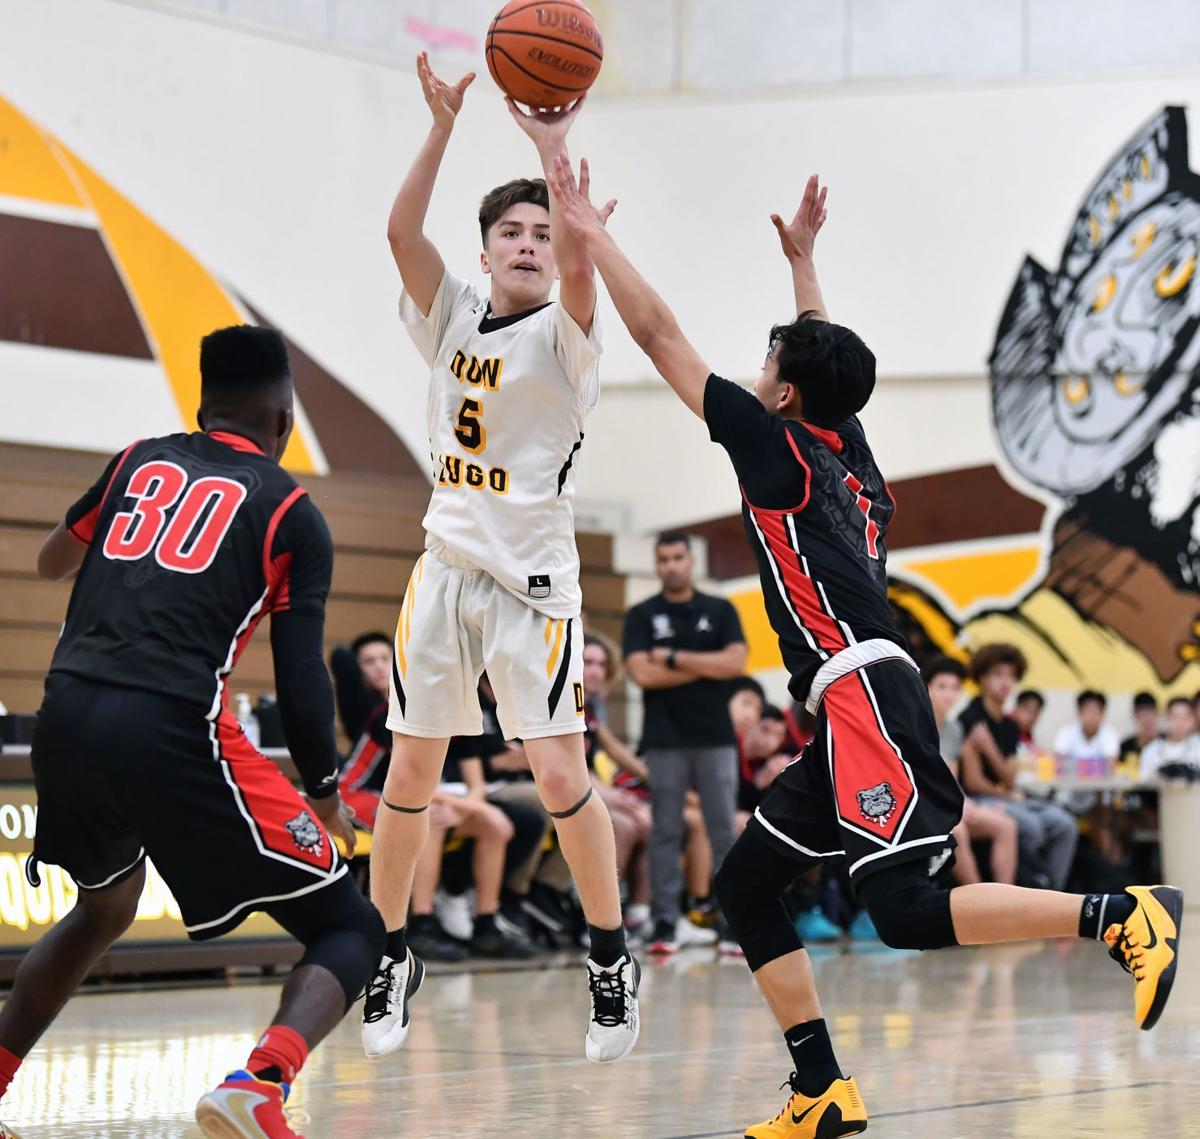 PHOTOS: Ayala 58, Don Lugo 51 Boys Basketball Jan. 4, 2020